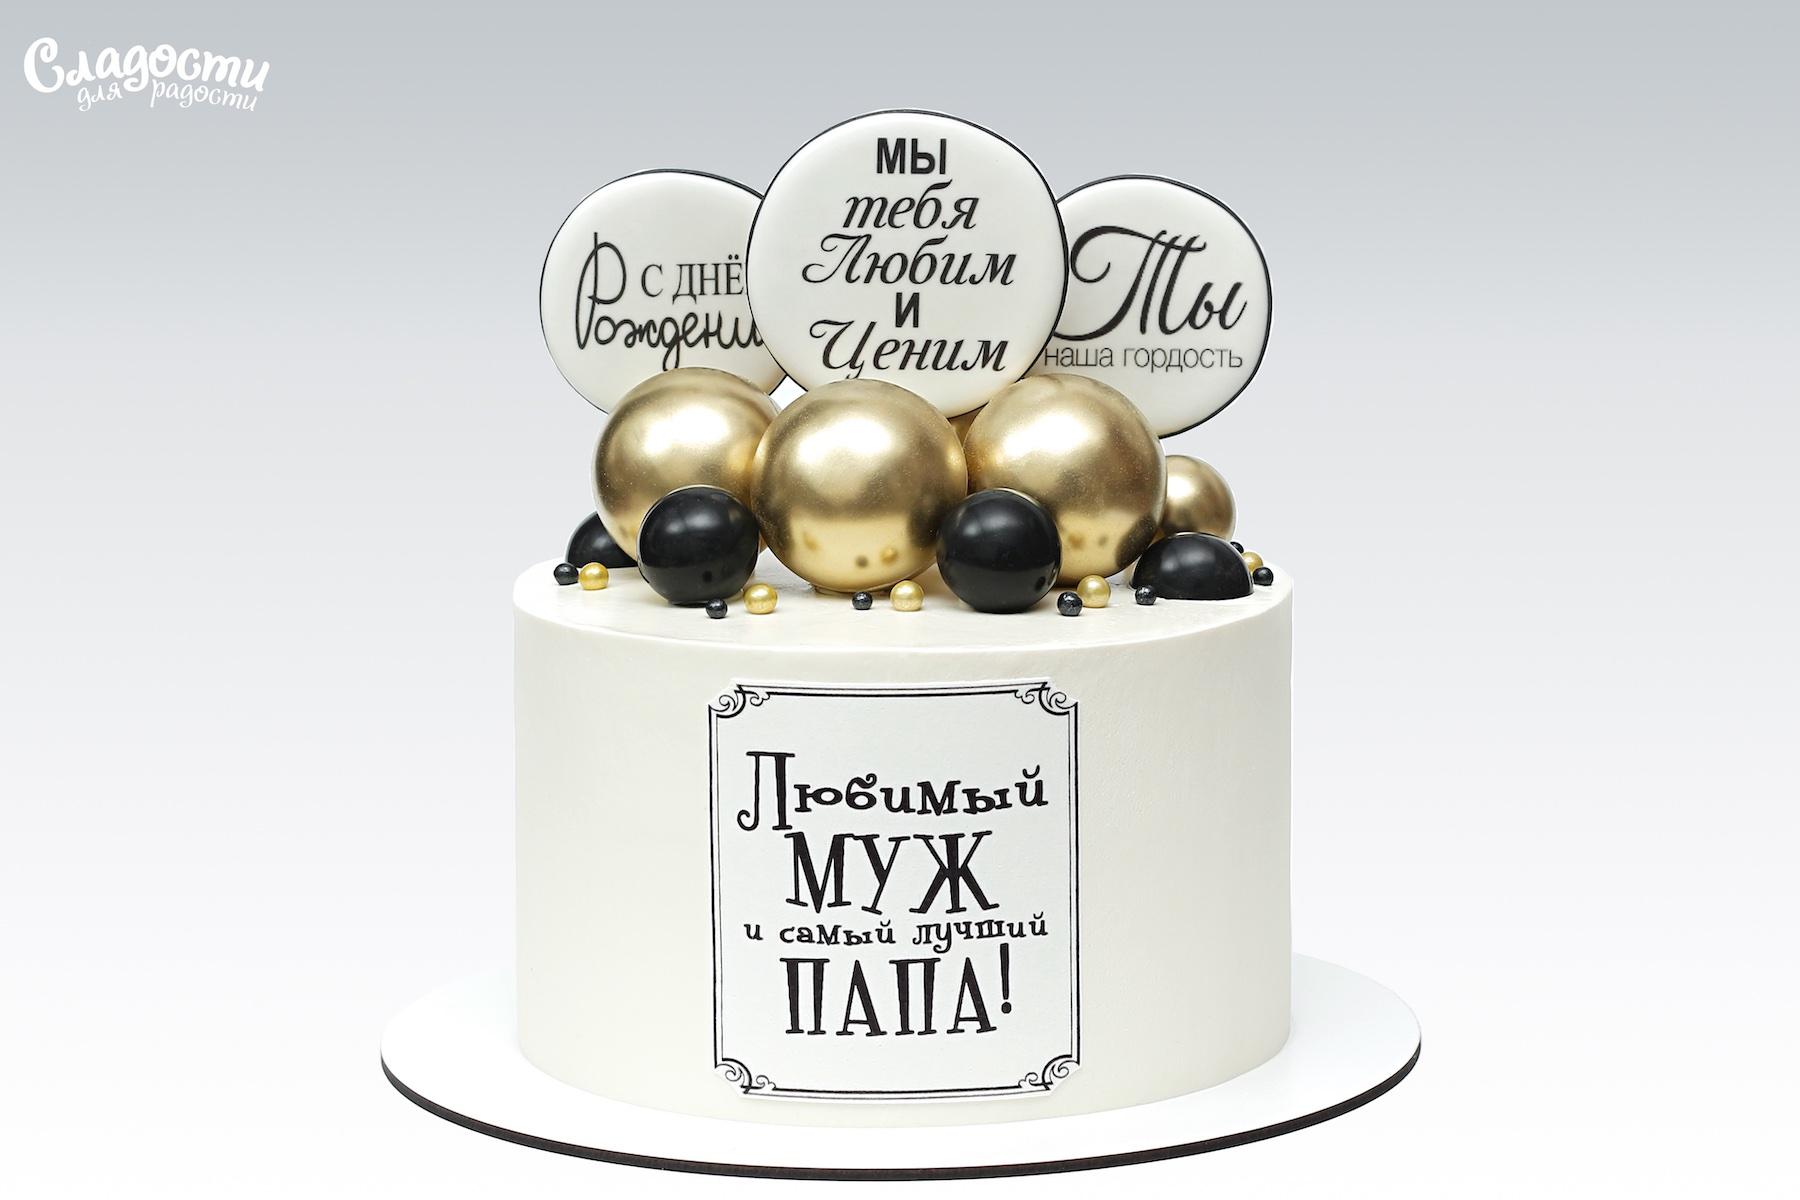 Торт для мужа Киев